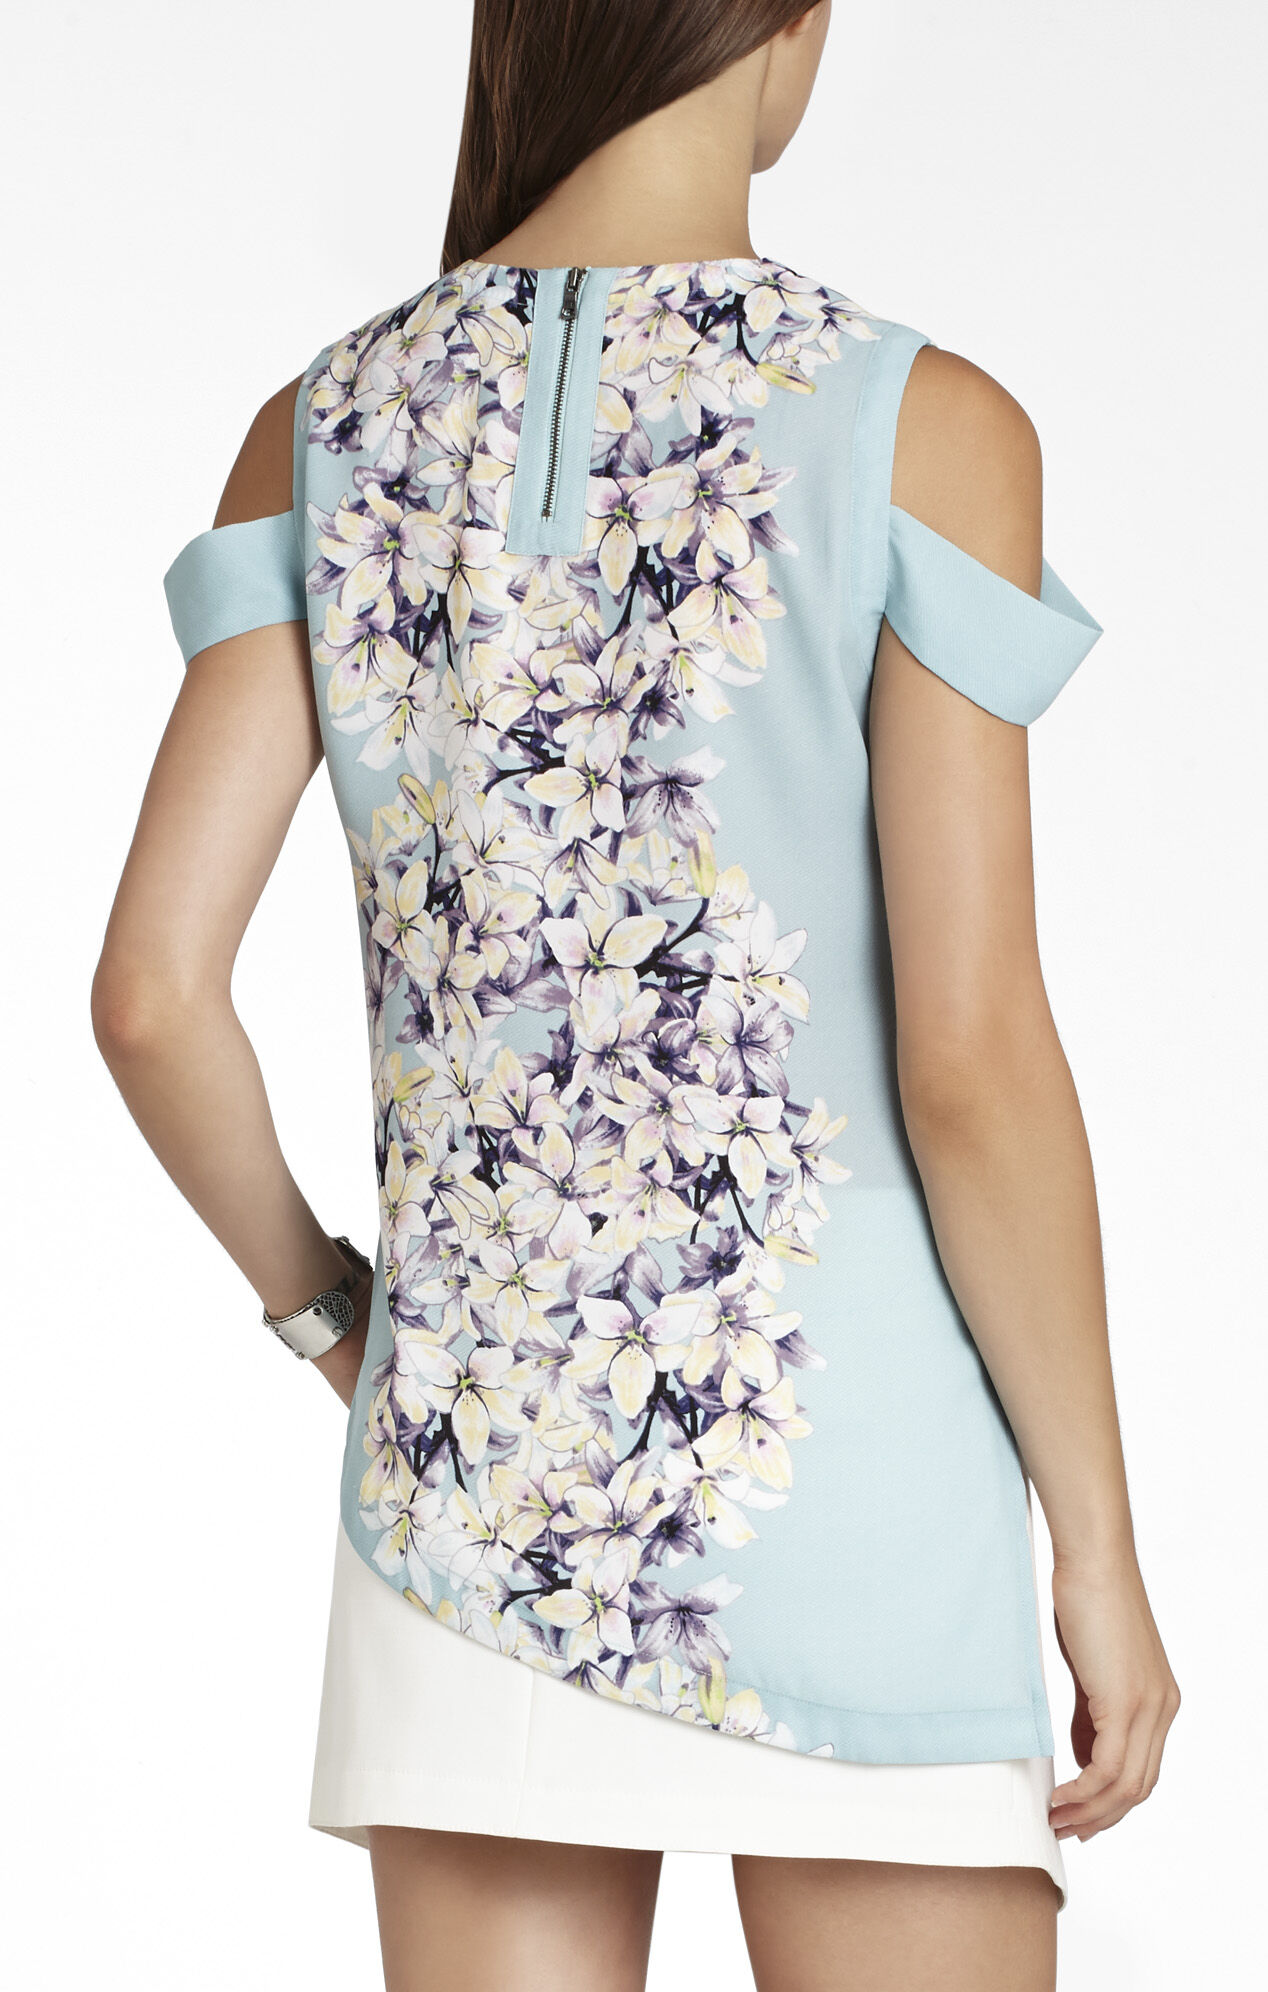 Alecia Sleeveless Asymmetrical-Hem Top